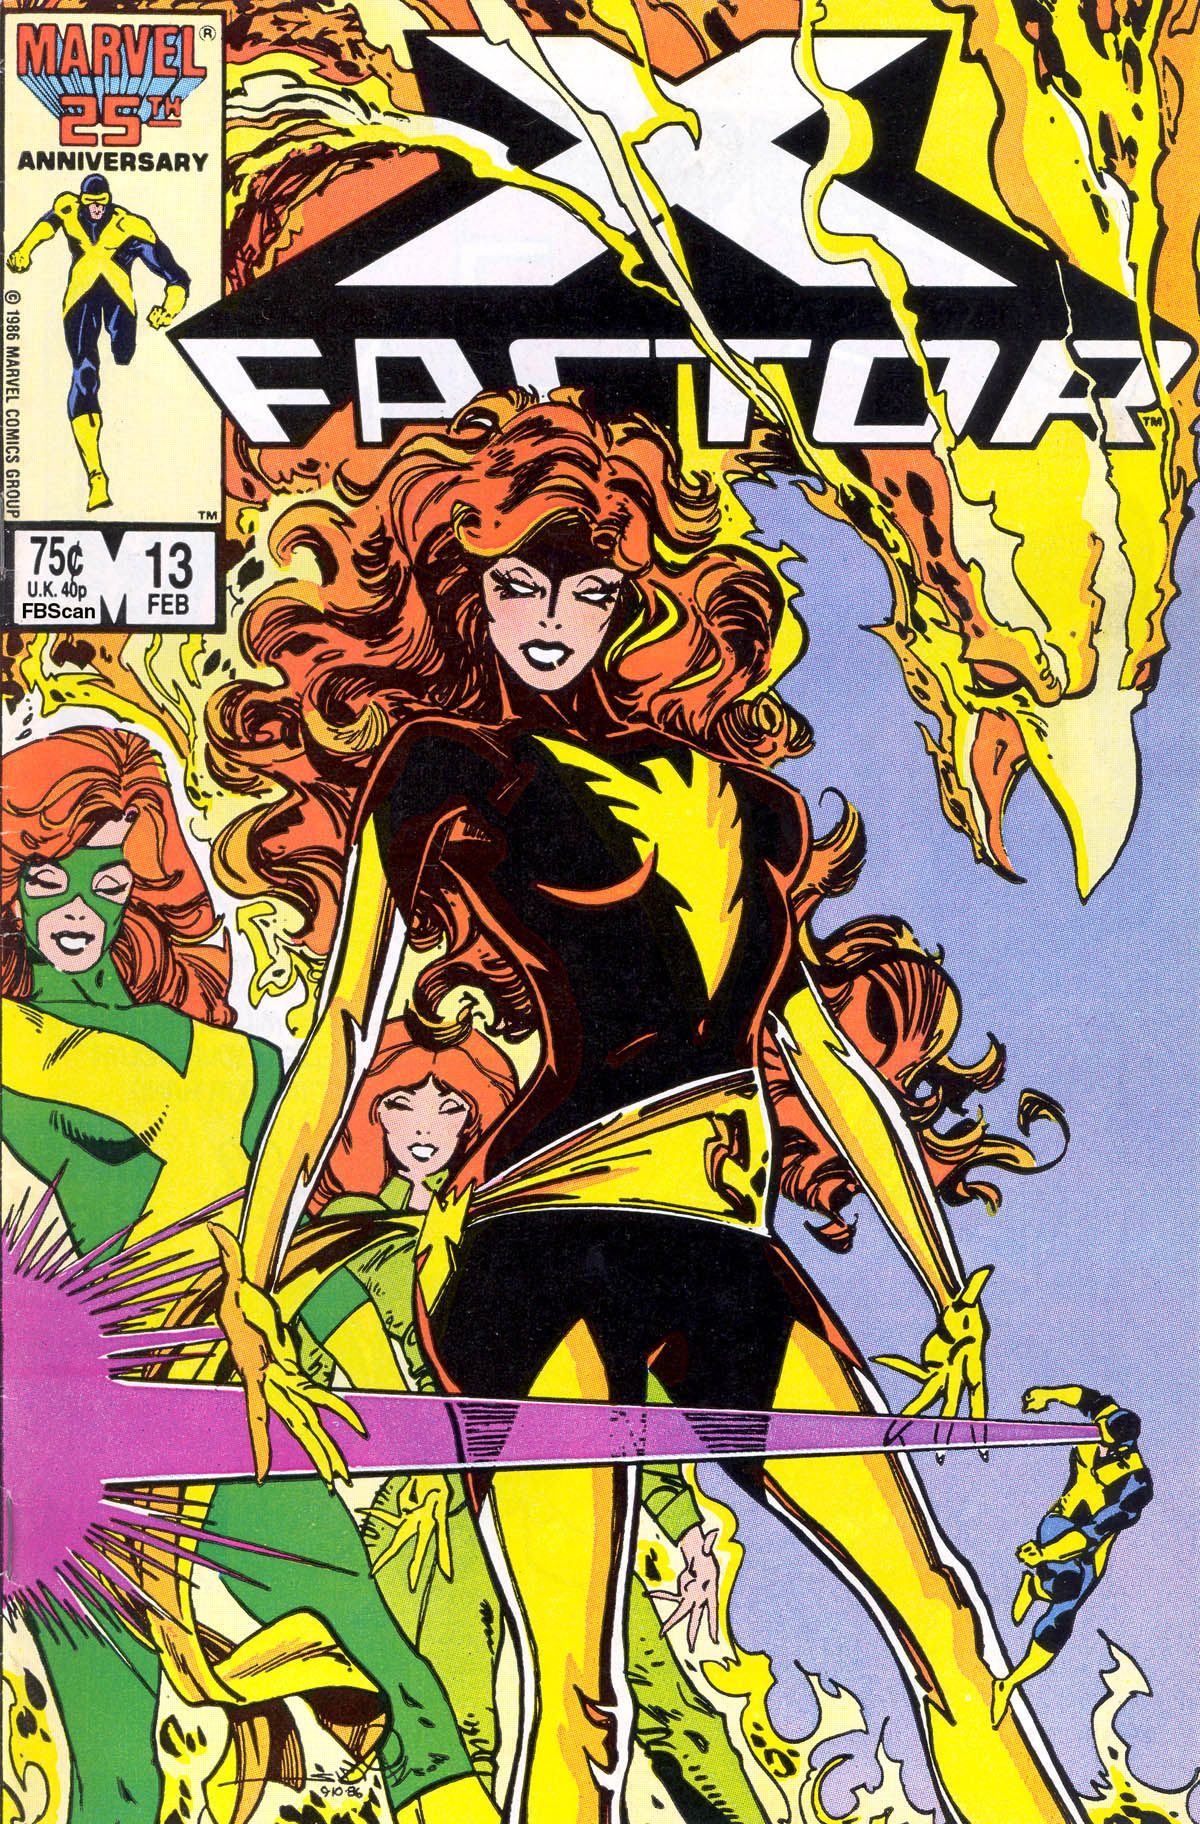 X Factor 13 February 1987 Cover By Walt Simonson Comics Marvel Comics Covers Comic Books